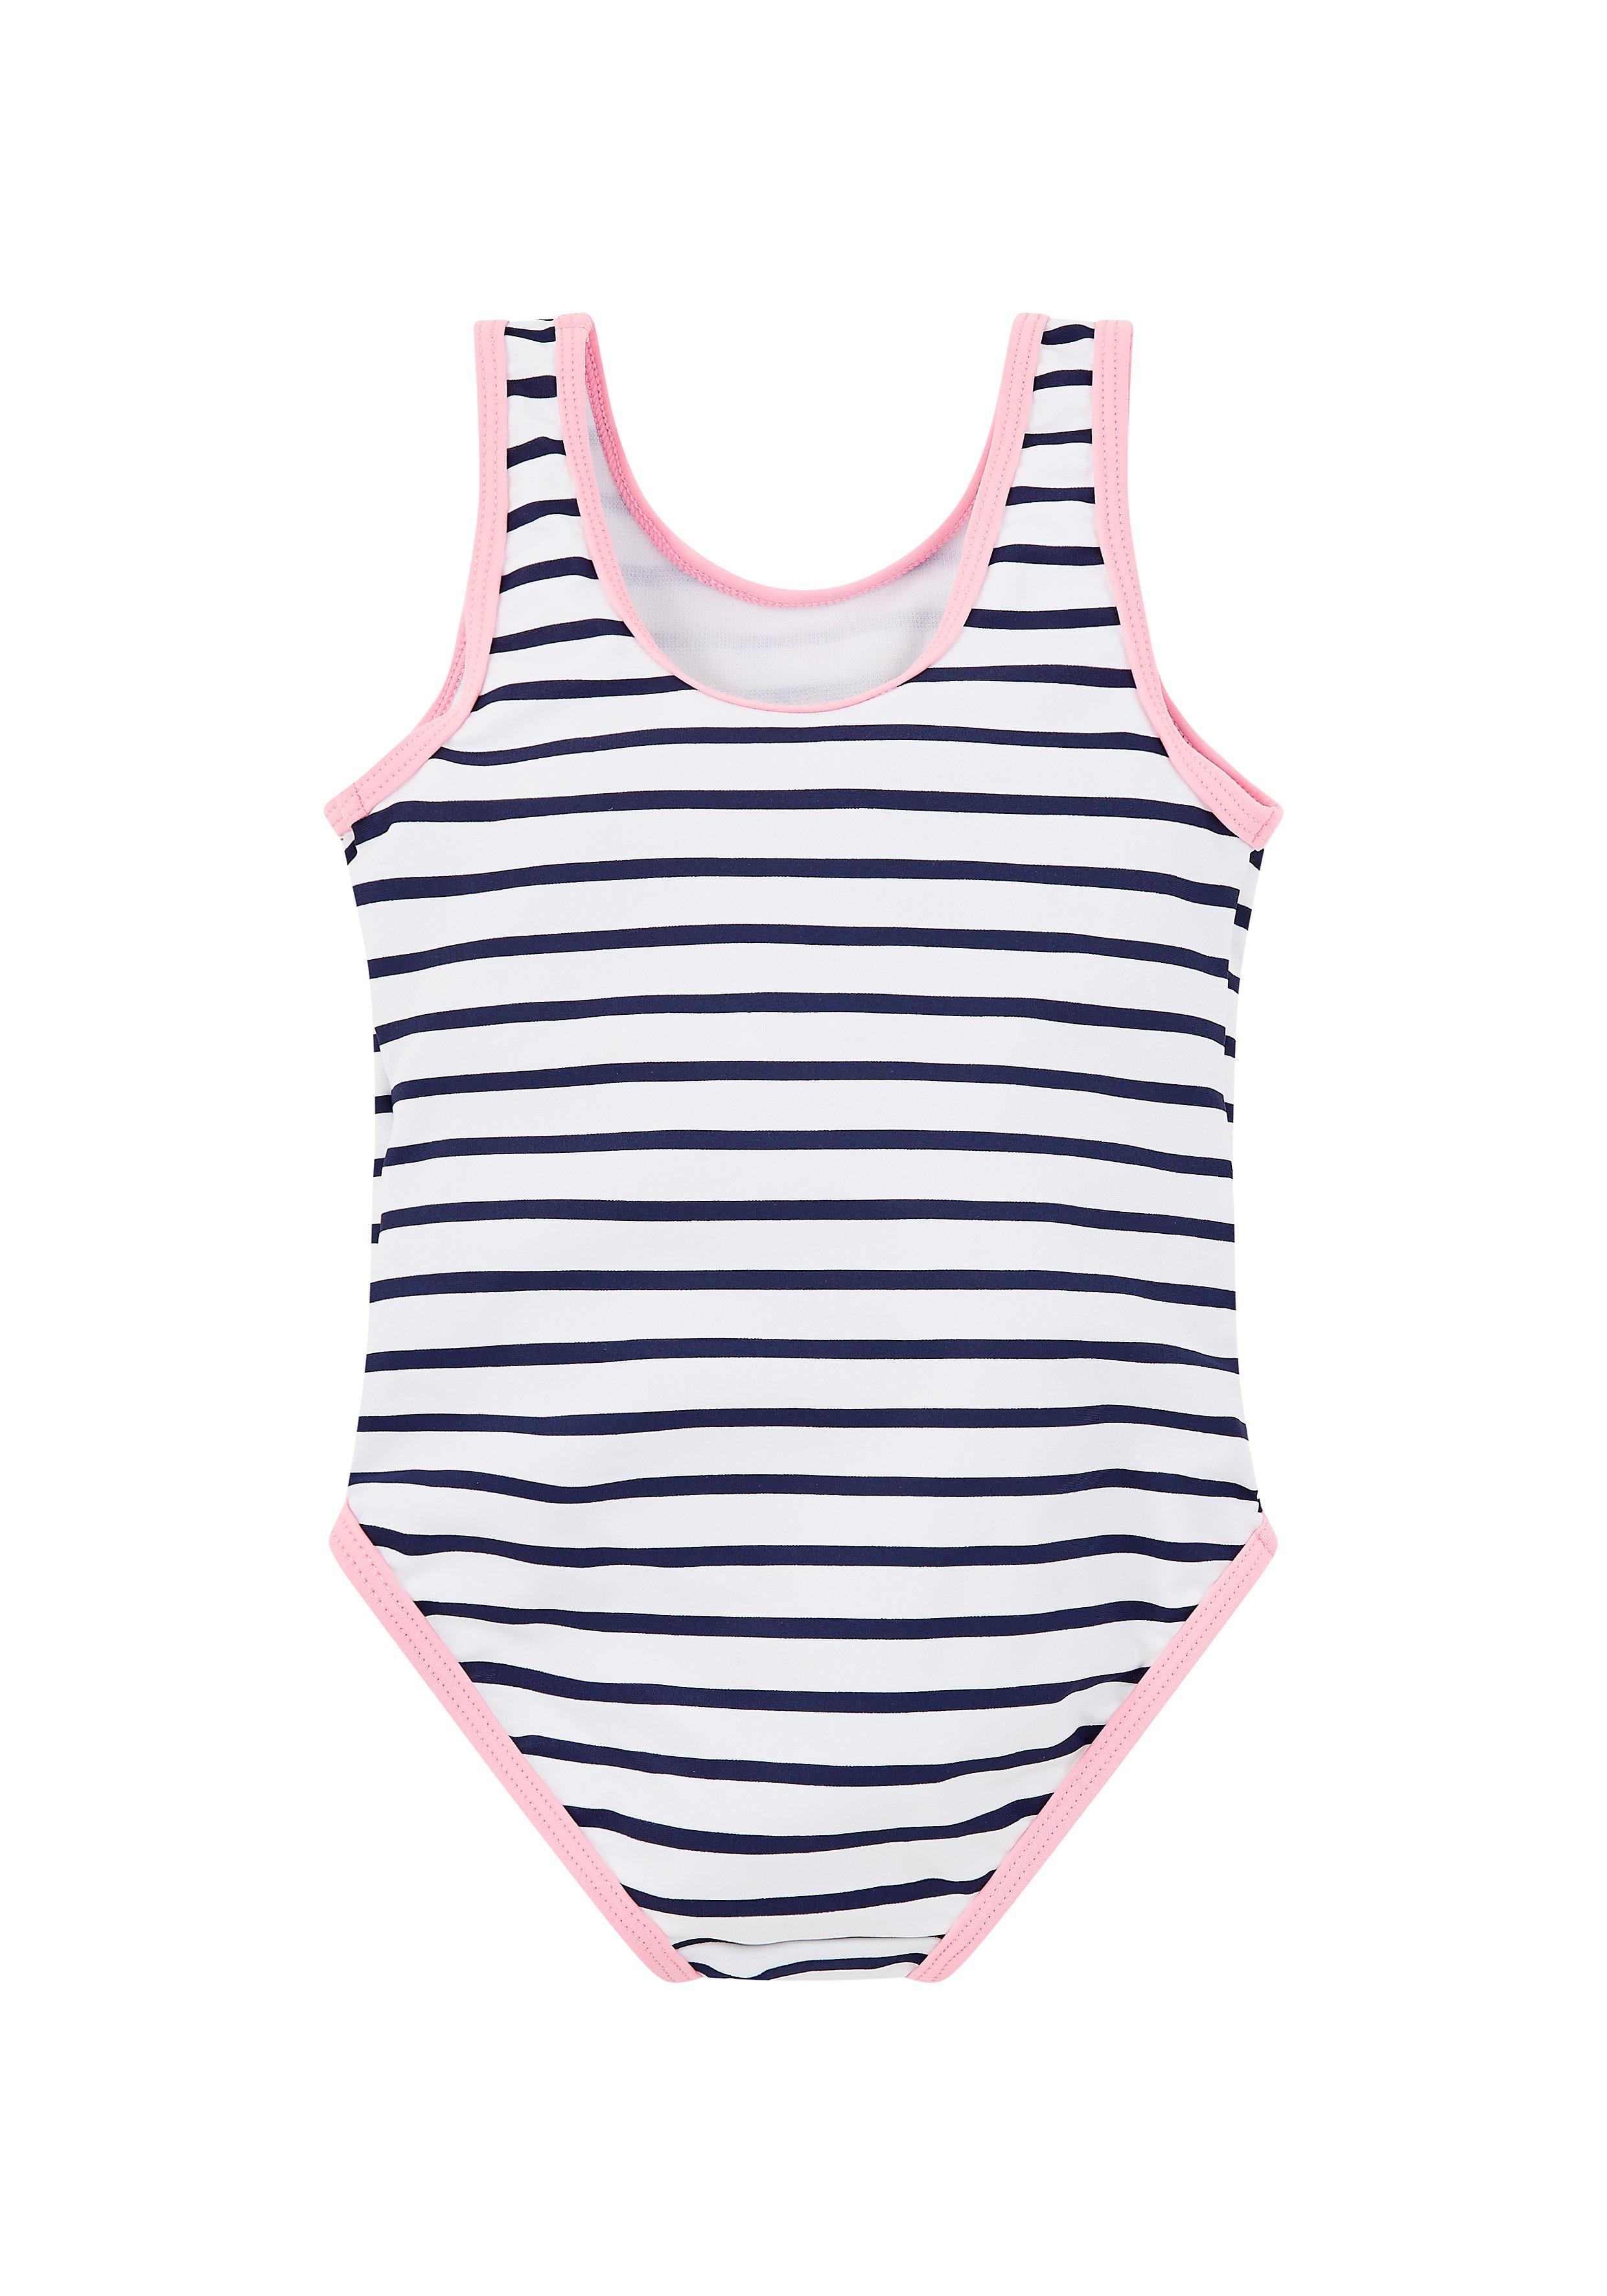 Mothercare | Girls Stripe Ice Cream Swimsuit - Blue & White